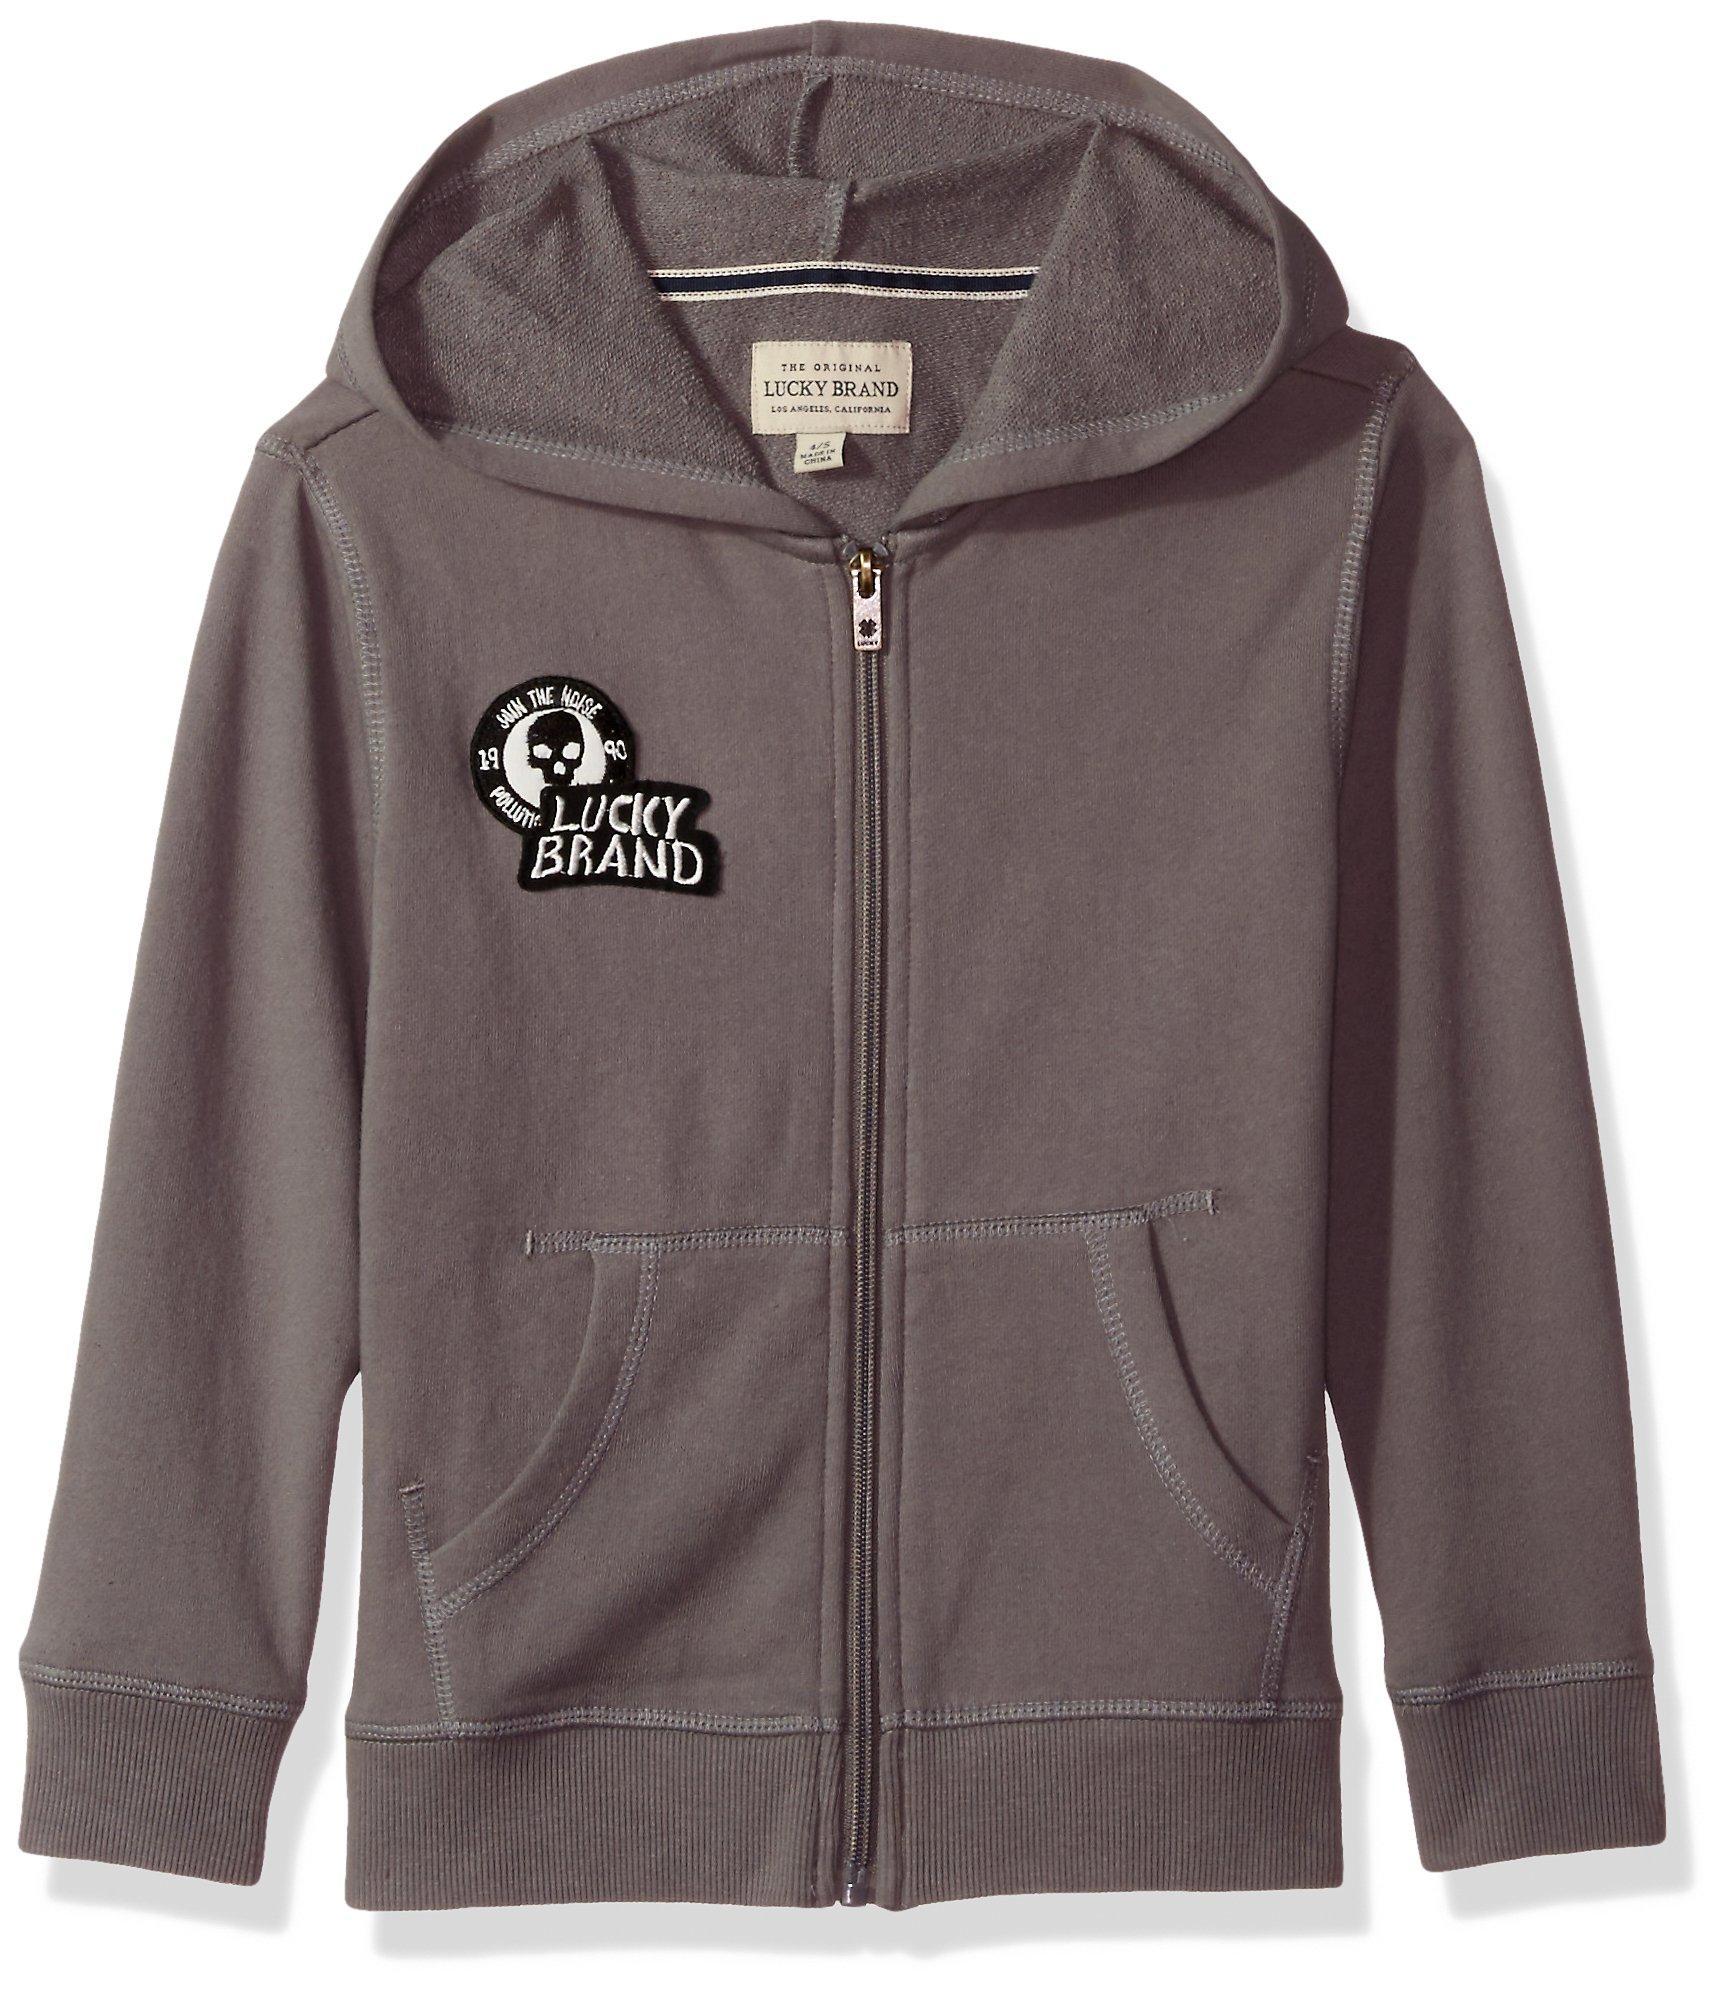 Lucky Brand Little Boys' Long Sleeve Zip up Hoody, Steel Grey, 6